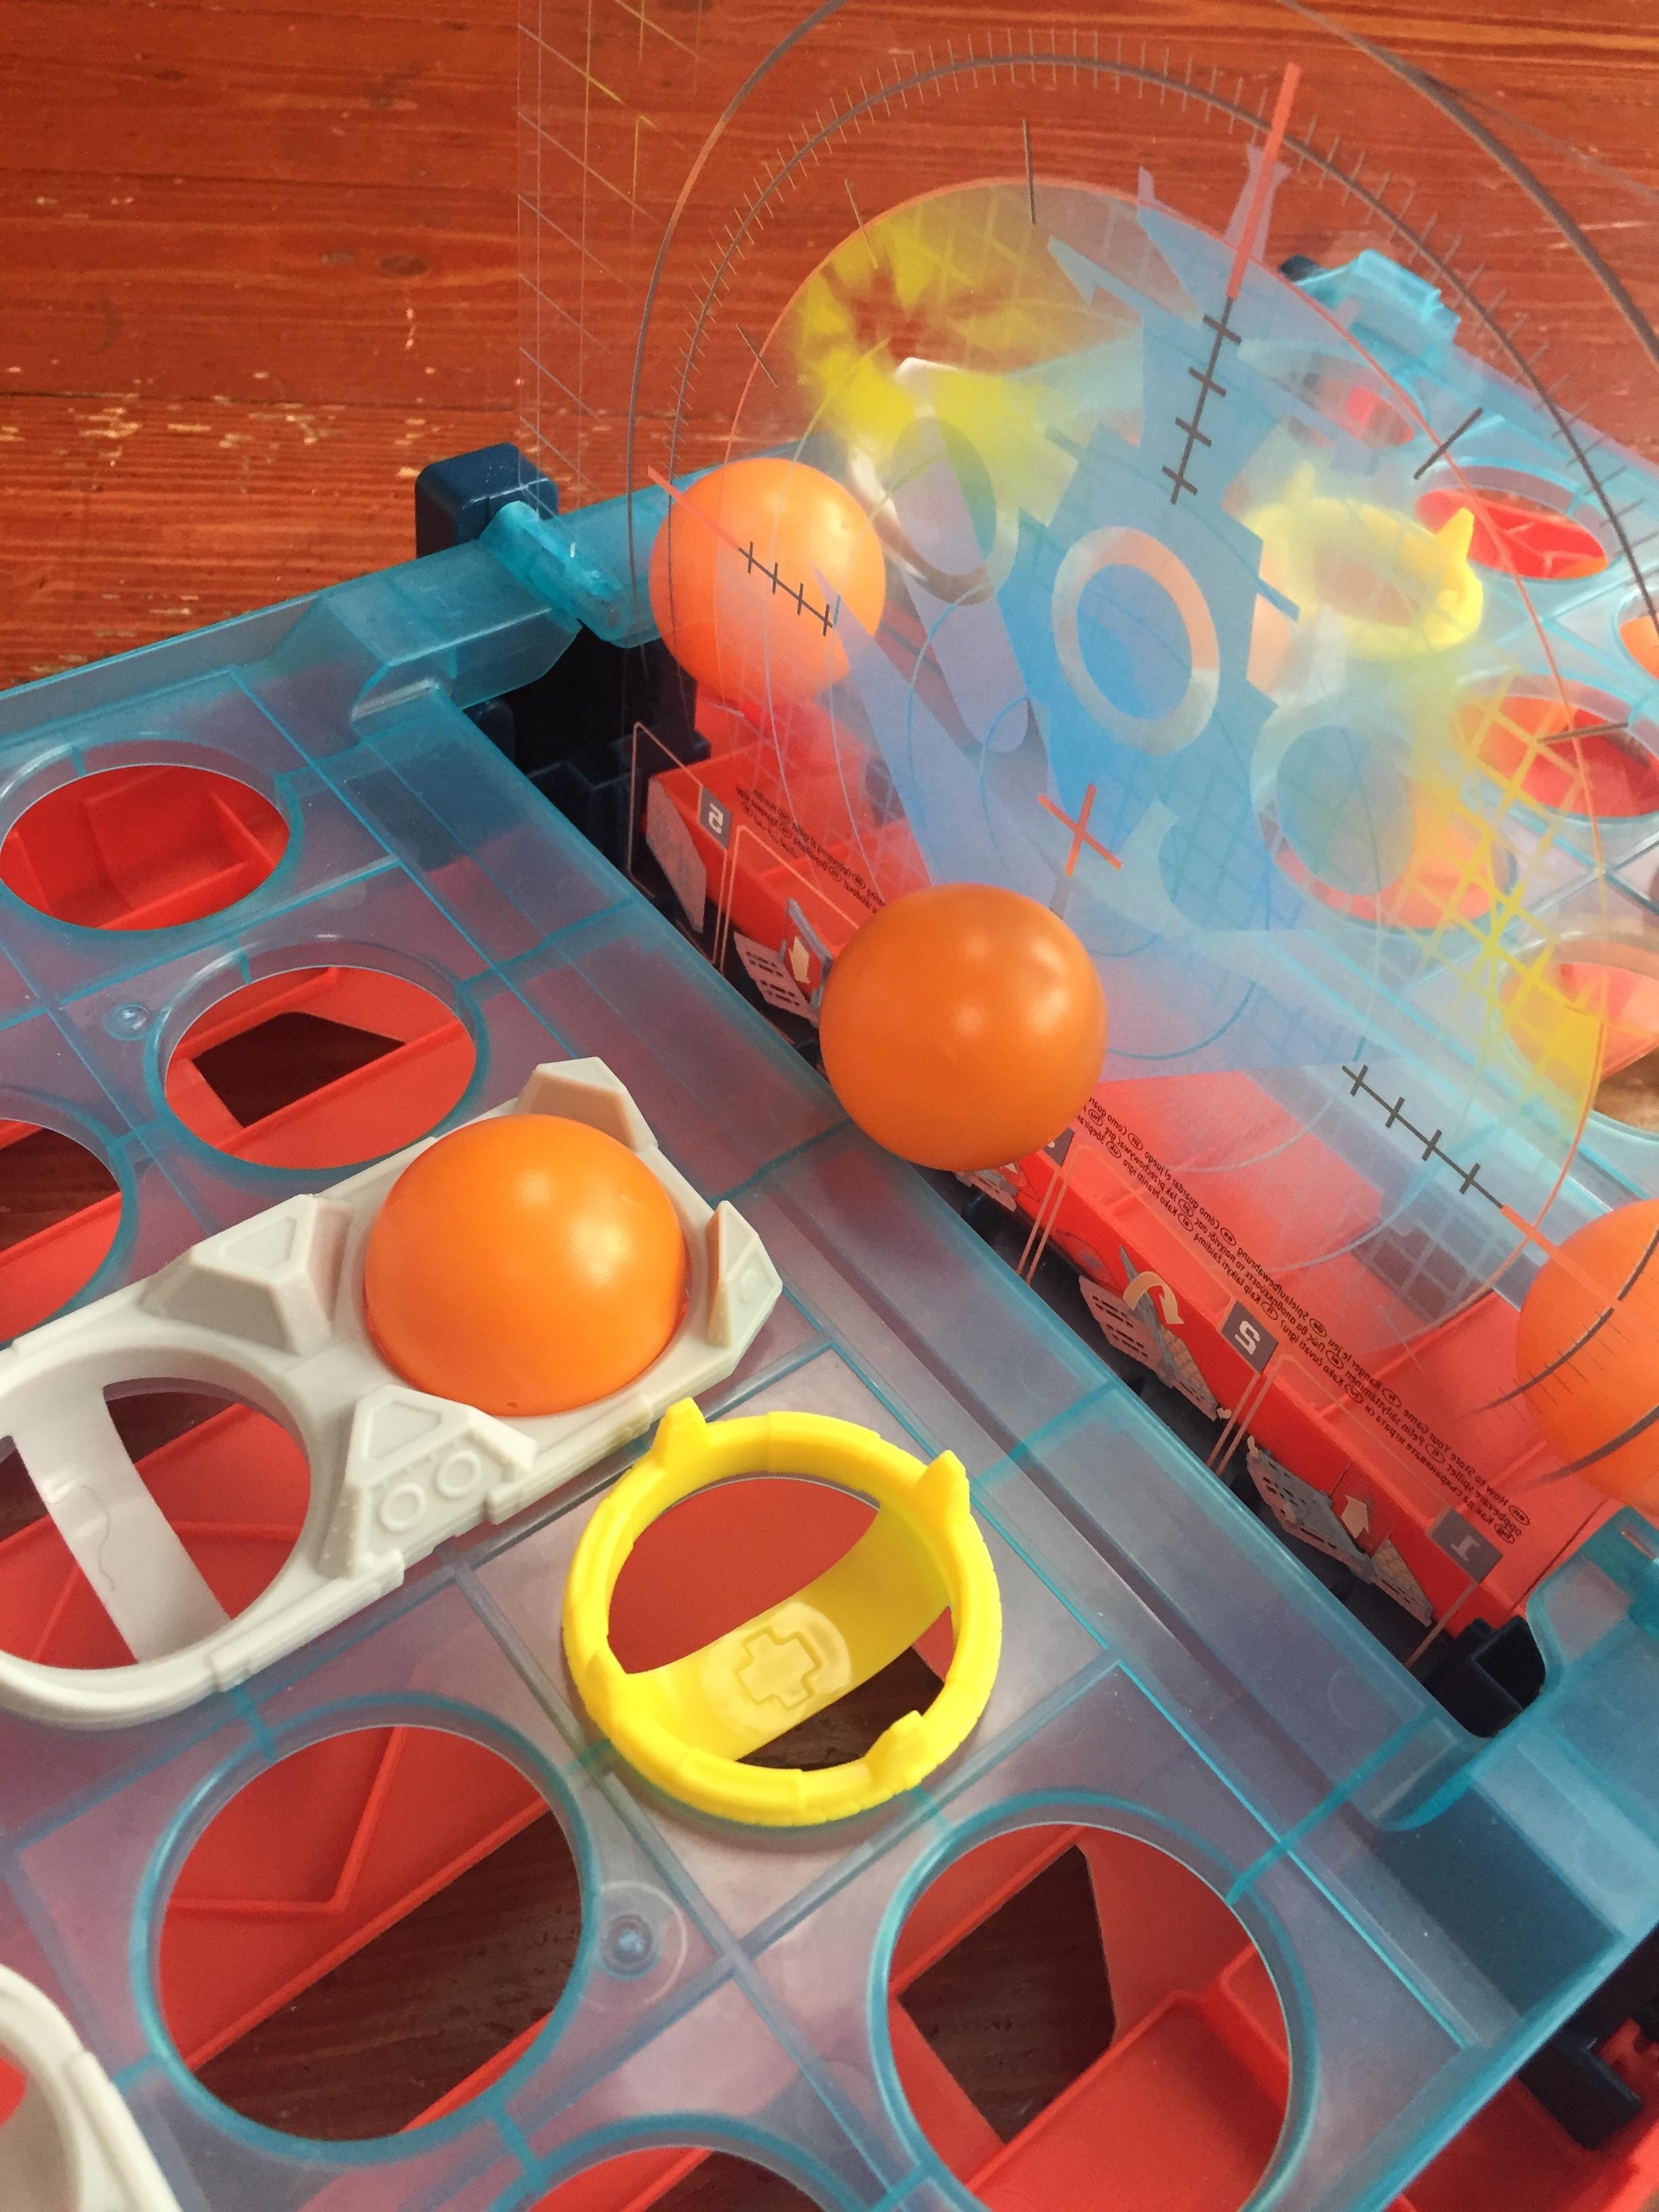 Battleship Shots game set up with orange balls